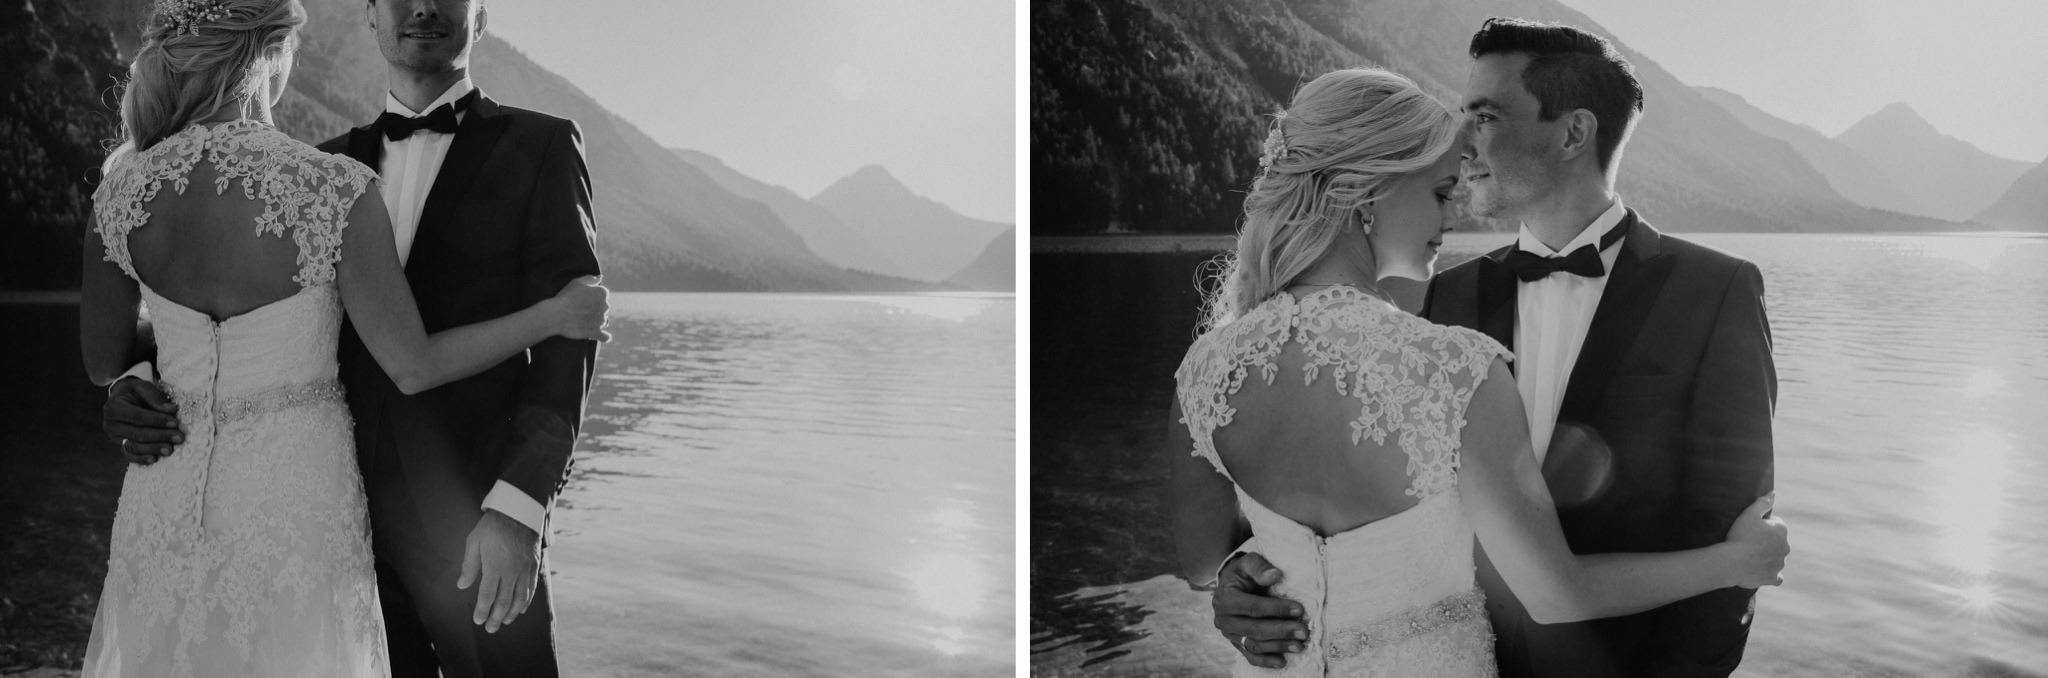 wedding photographer hamilton new zealand 12